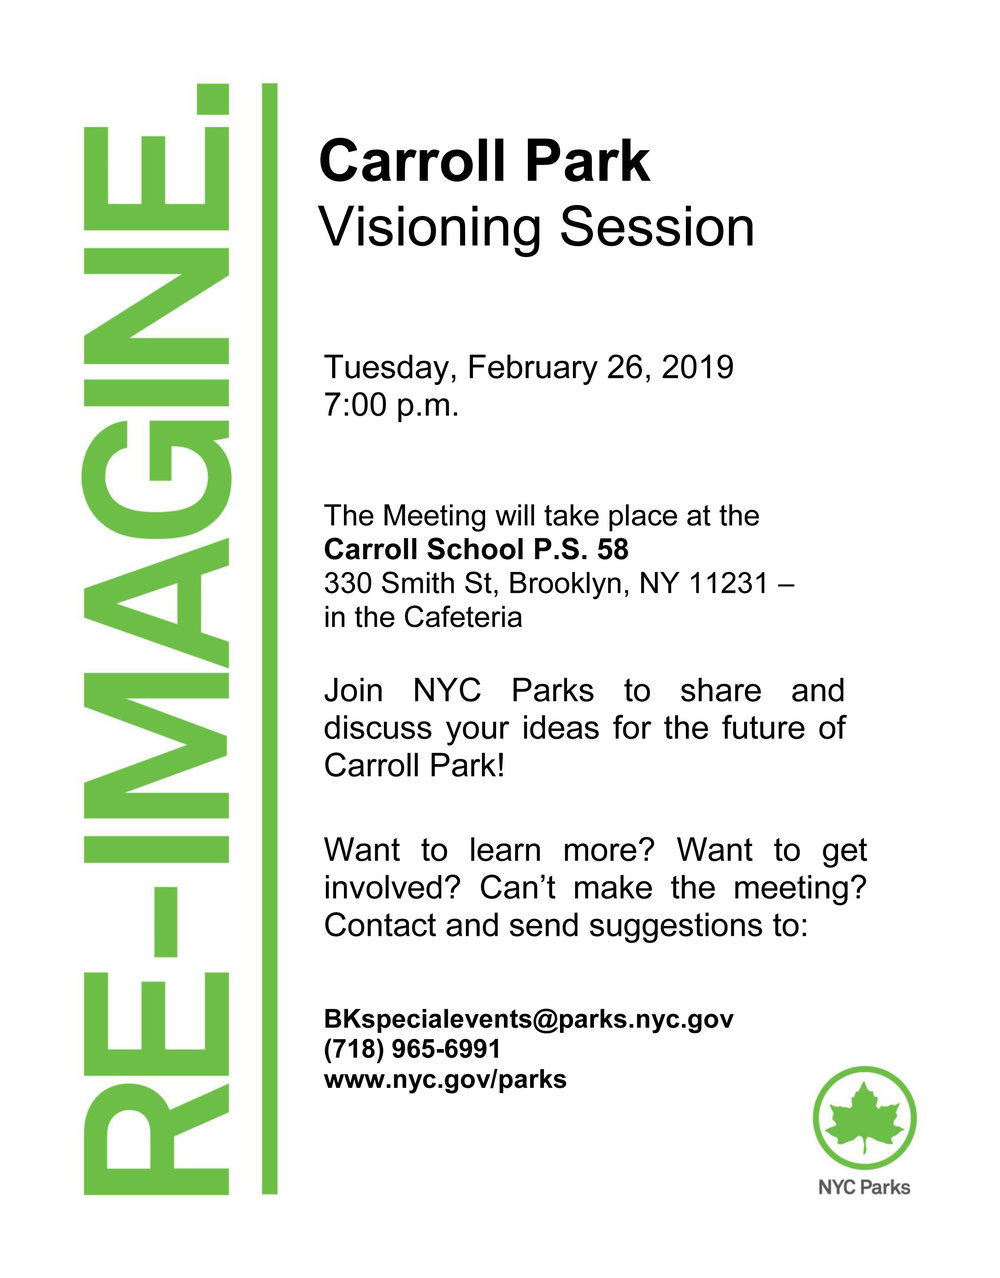 Carroll Park scope meeting flyer 2-26-19 - color-1.jpg